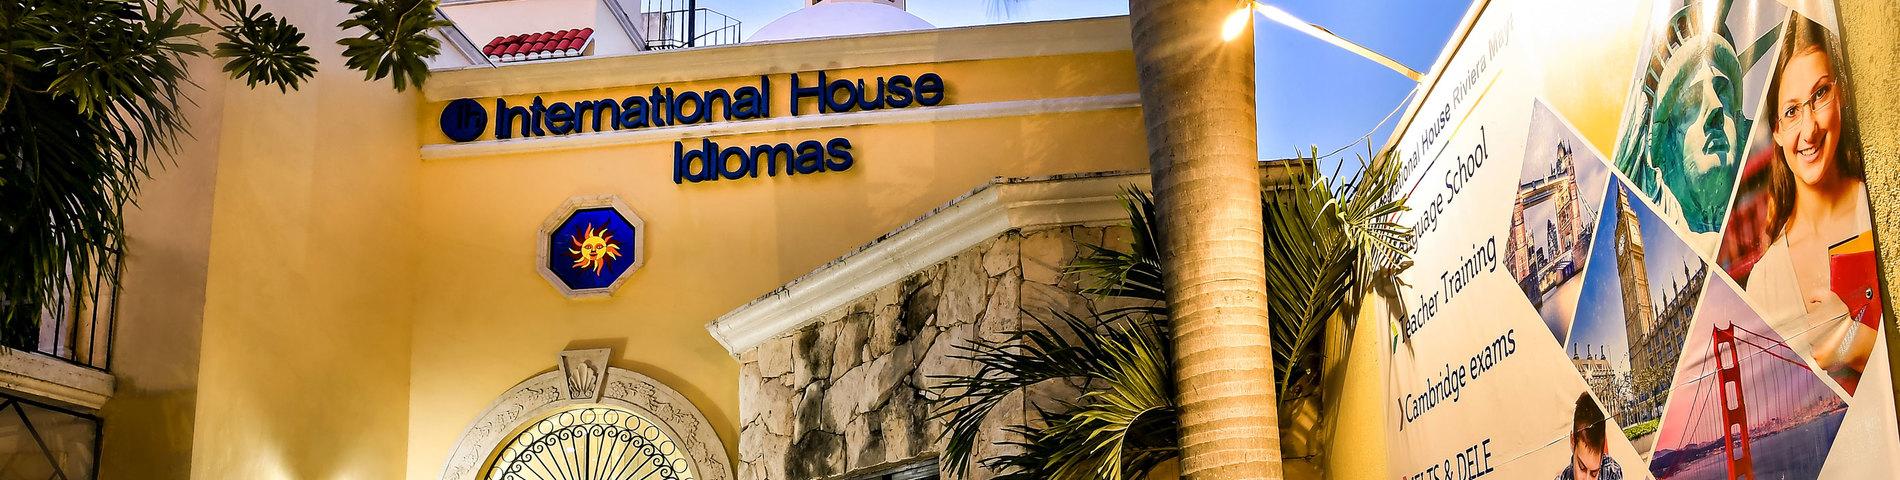 International House - Riviera Maya bild 1